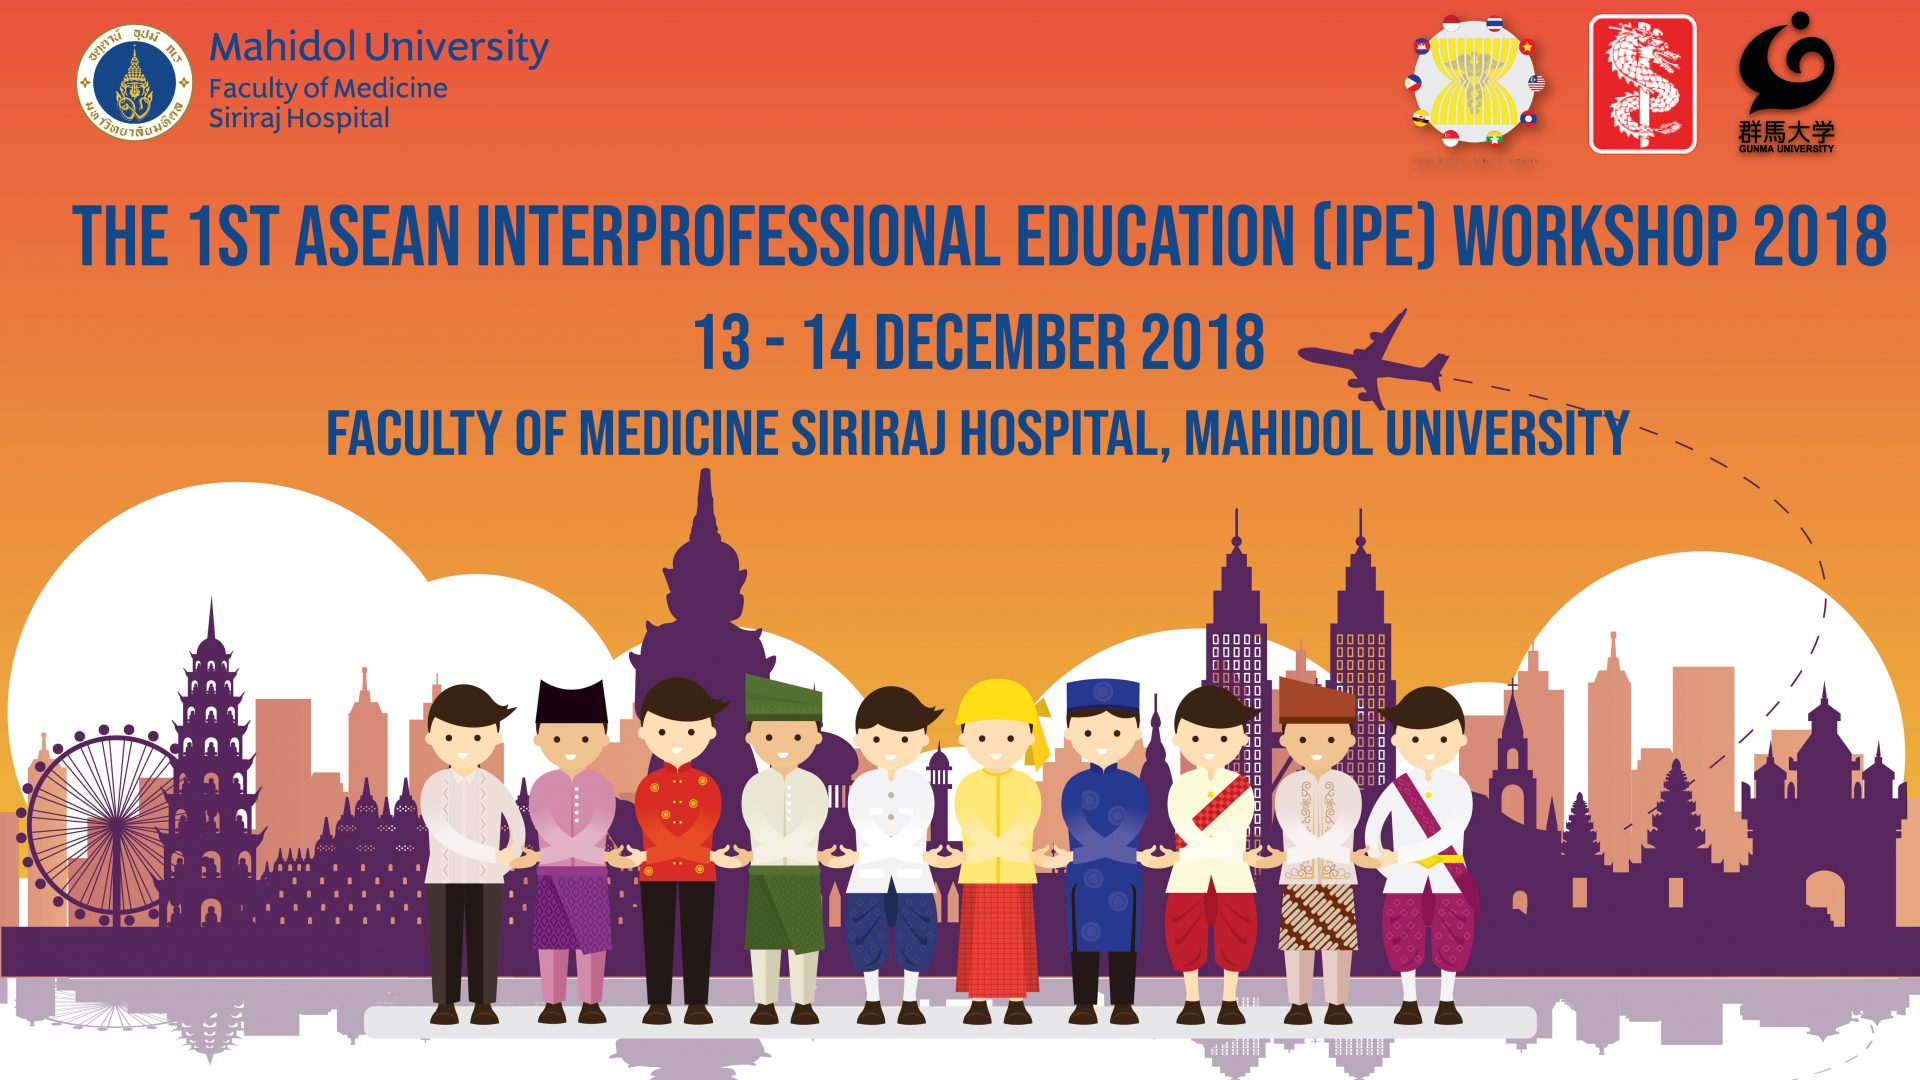 The 1st ASEAN Interprofession Education (IPE) Workshop 2018